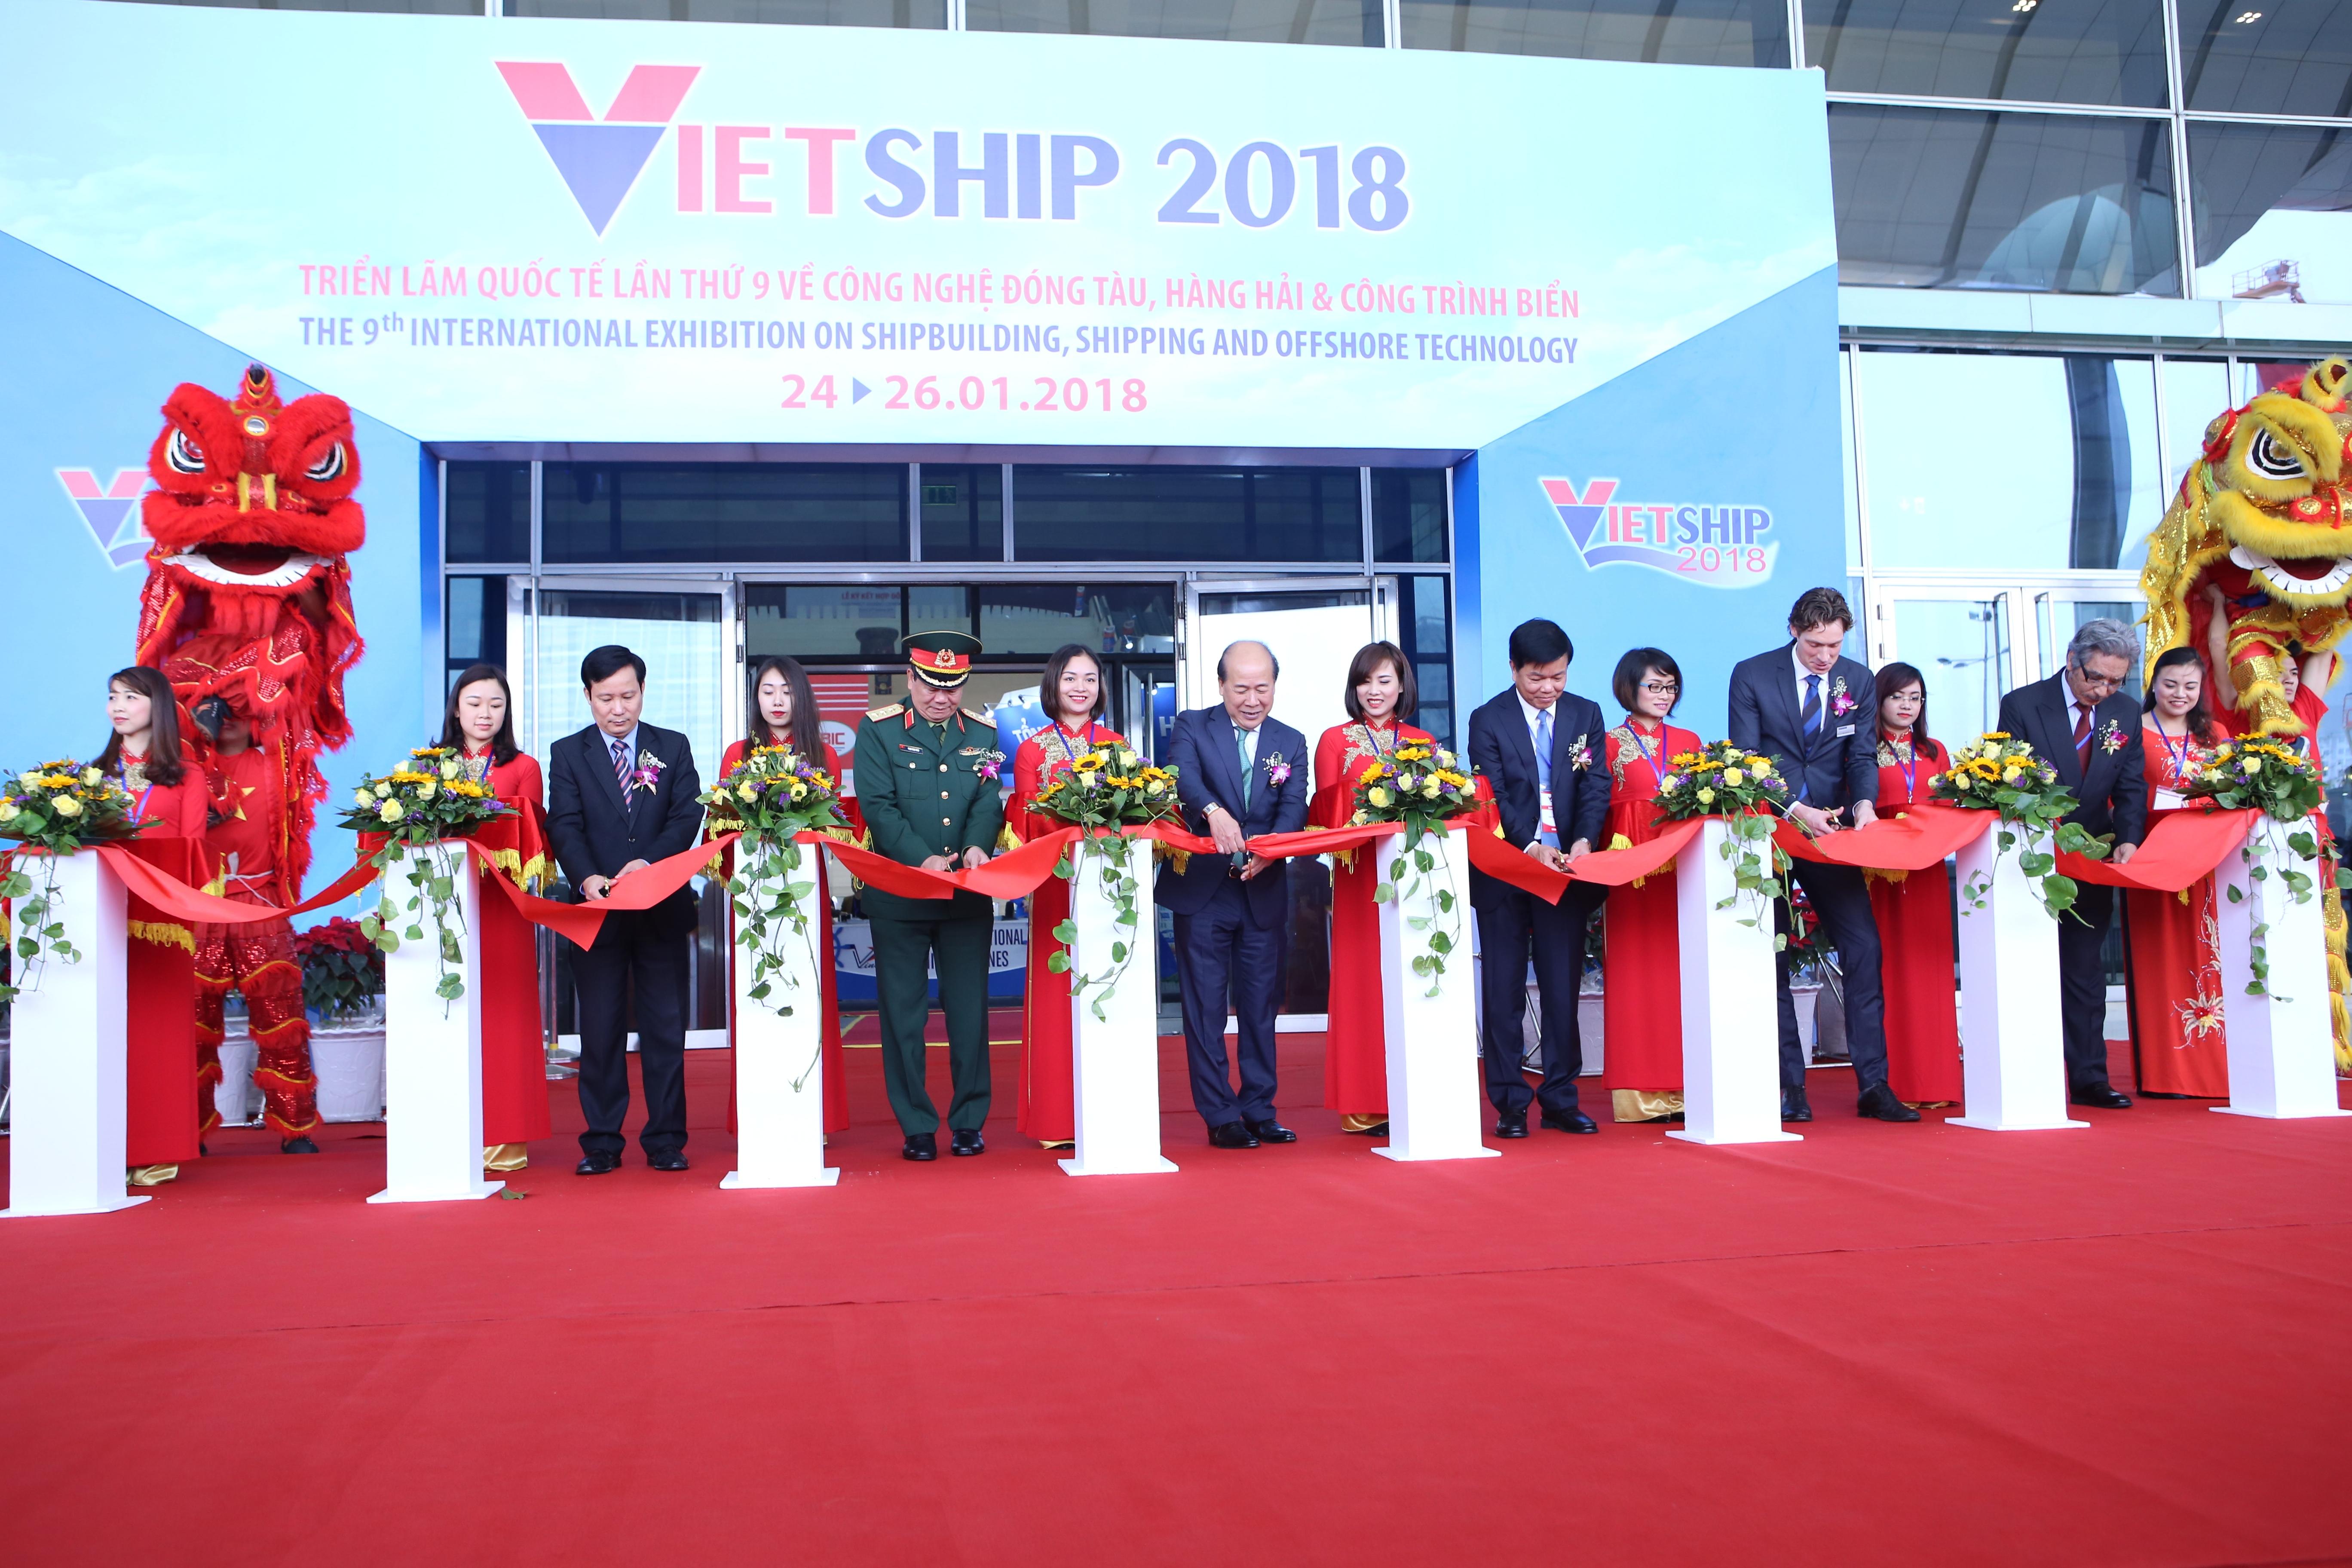 100 Vietnamese and international groups attend Vietship 2018